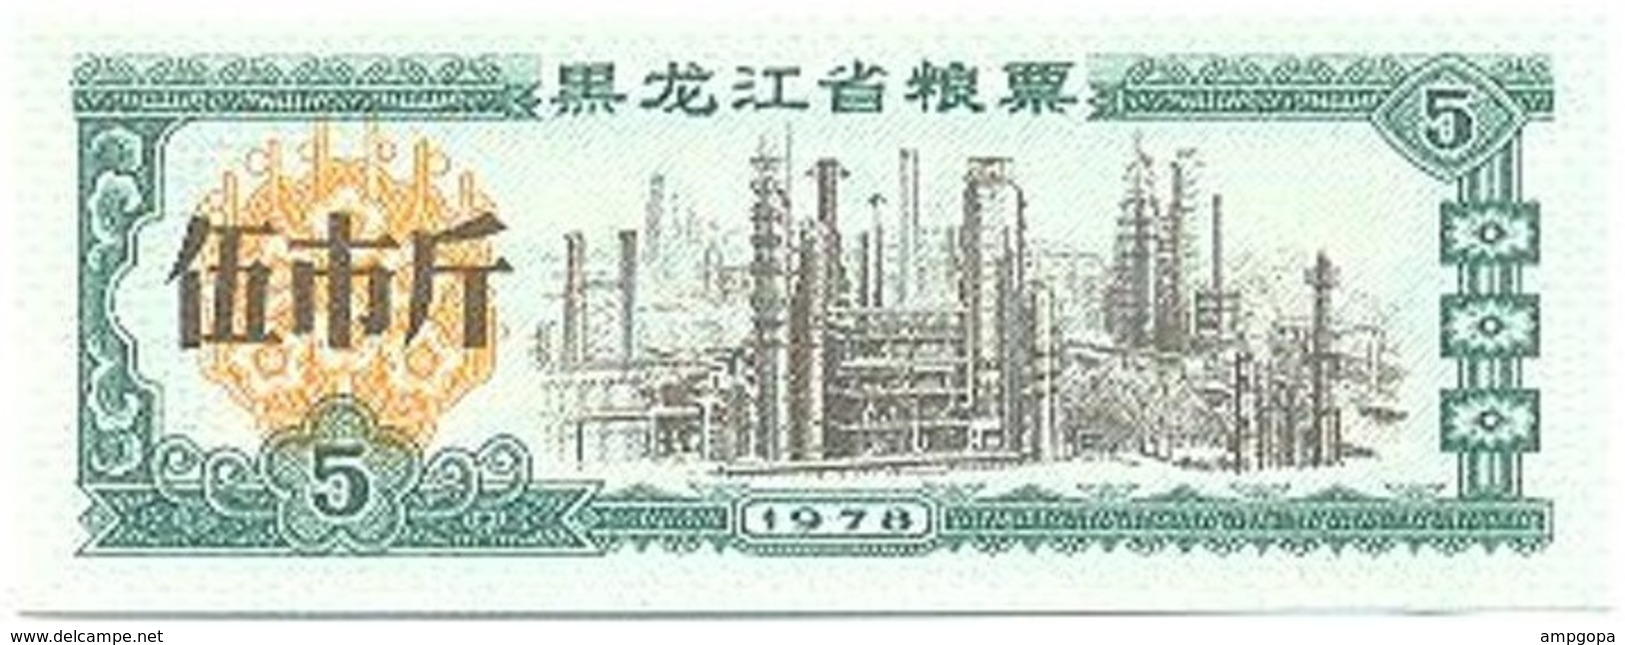 China (CUPONES) 5 Kilos 1978 Heilongjiang Cn 23 5000 UNC - China